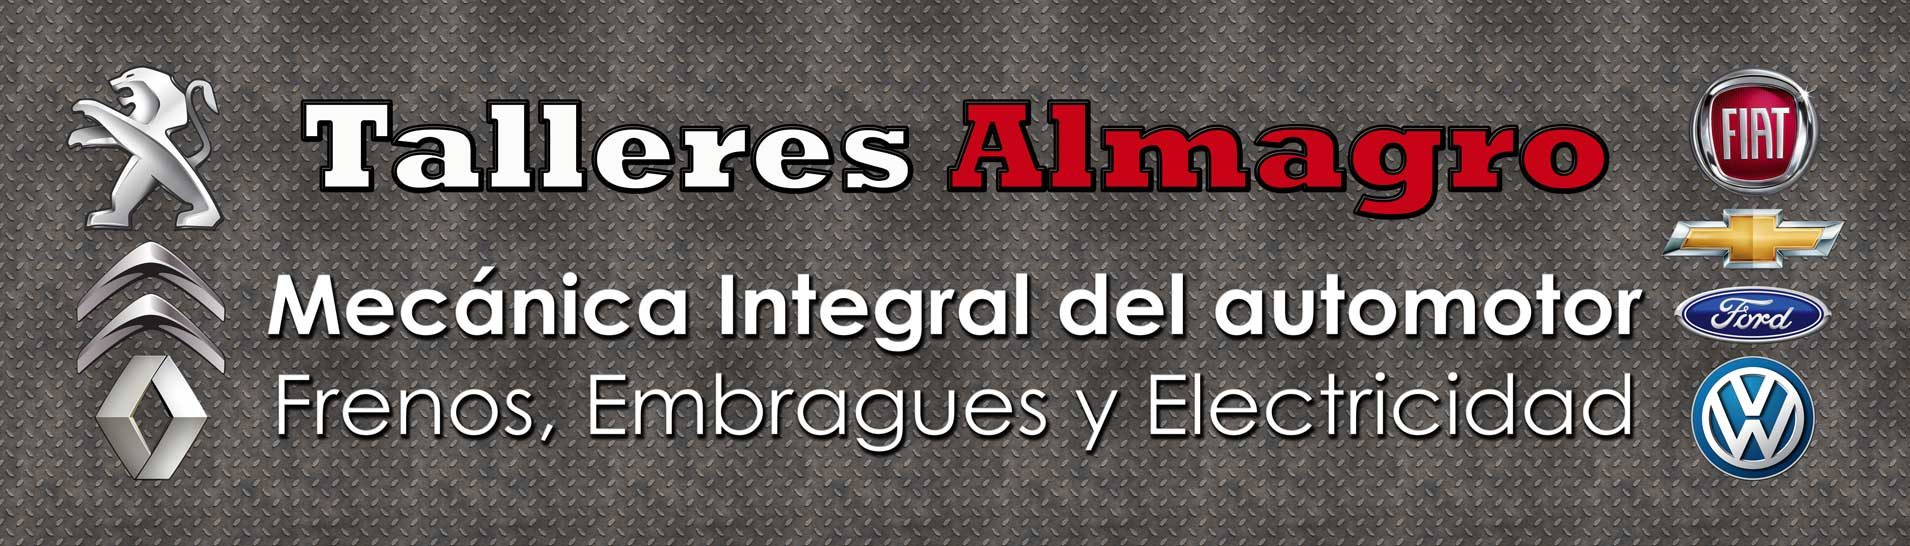 Talleres Almagro. Mecánica Integral del Automotor